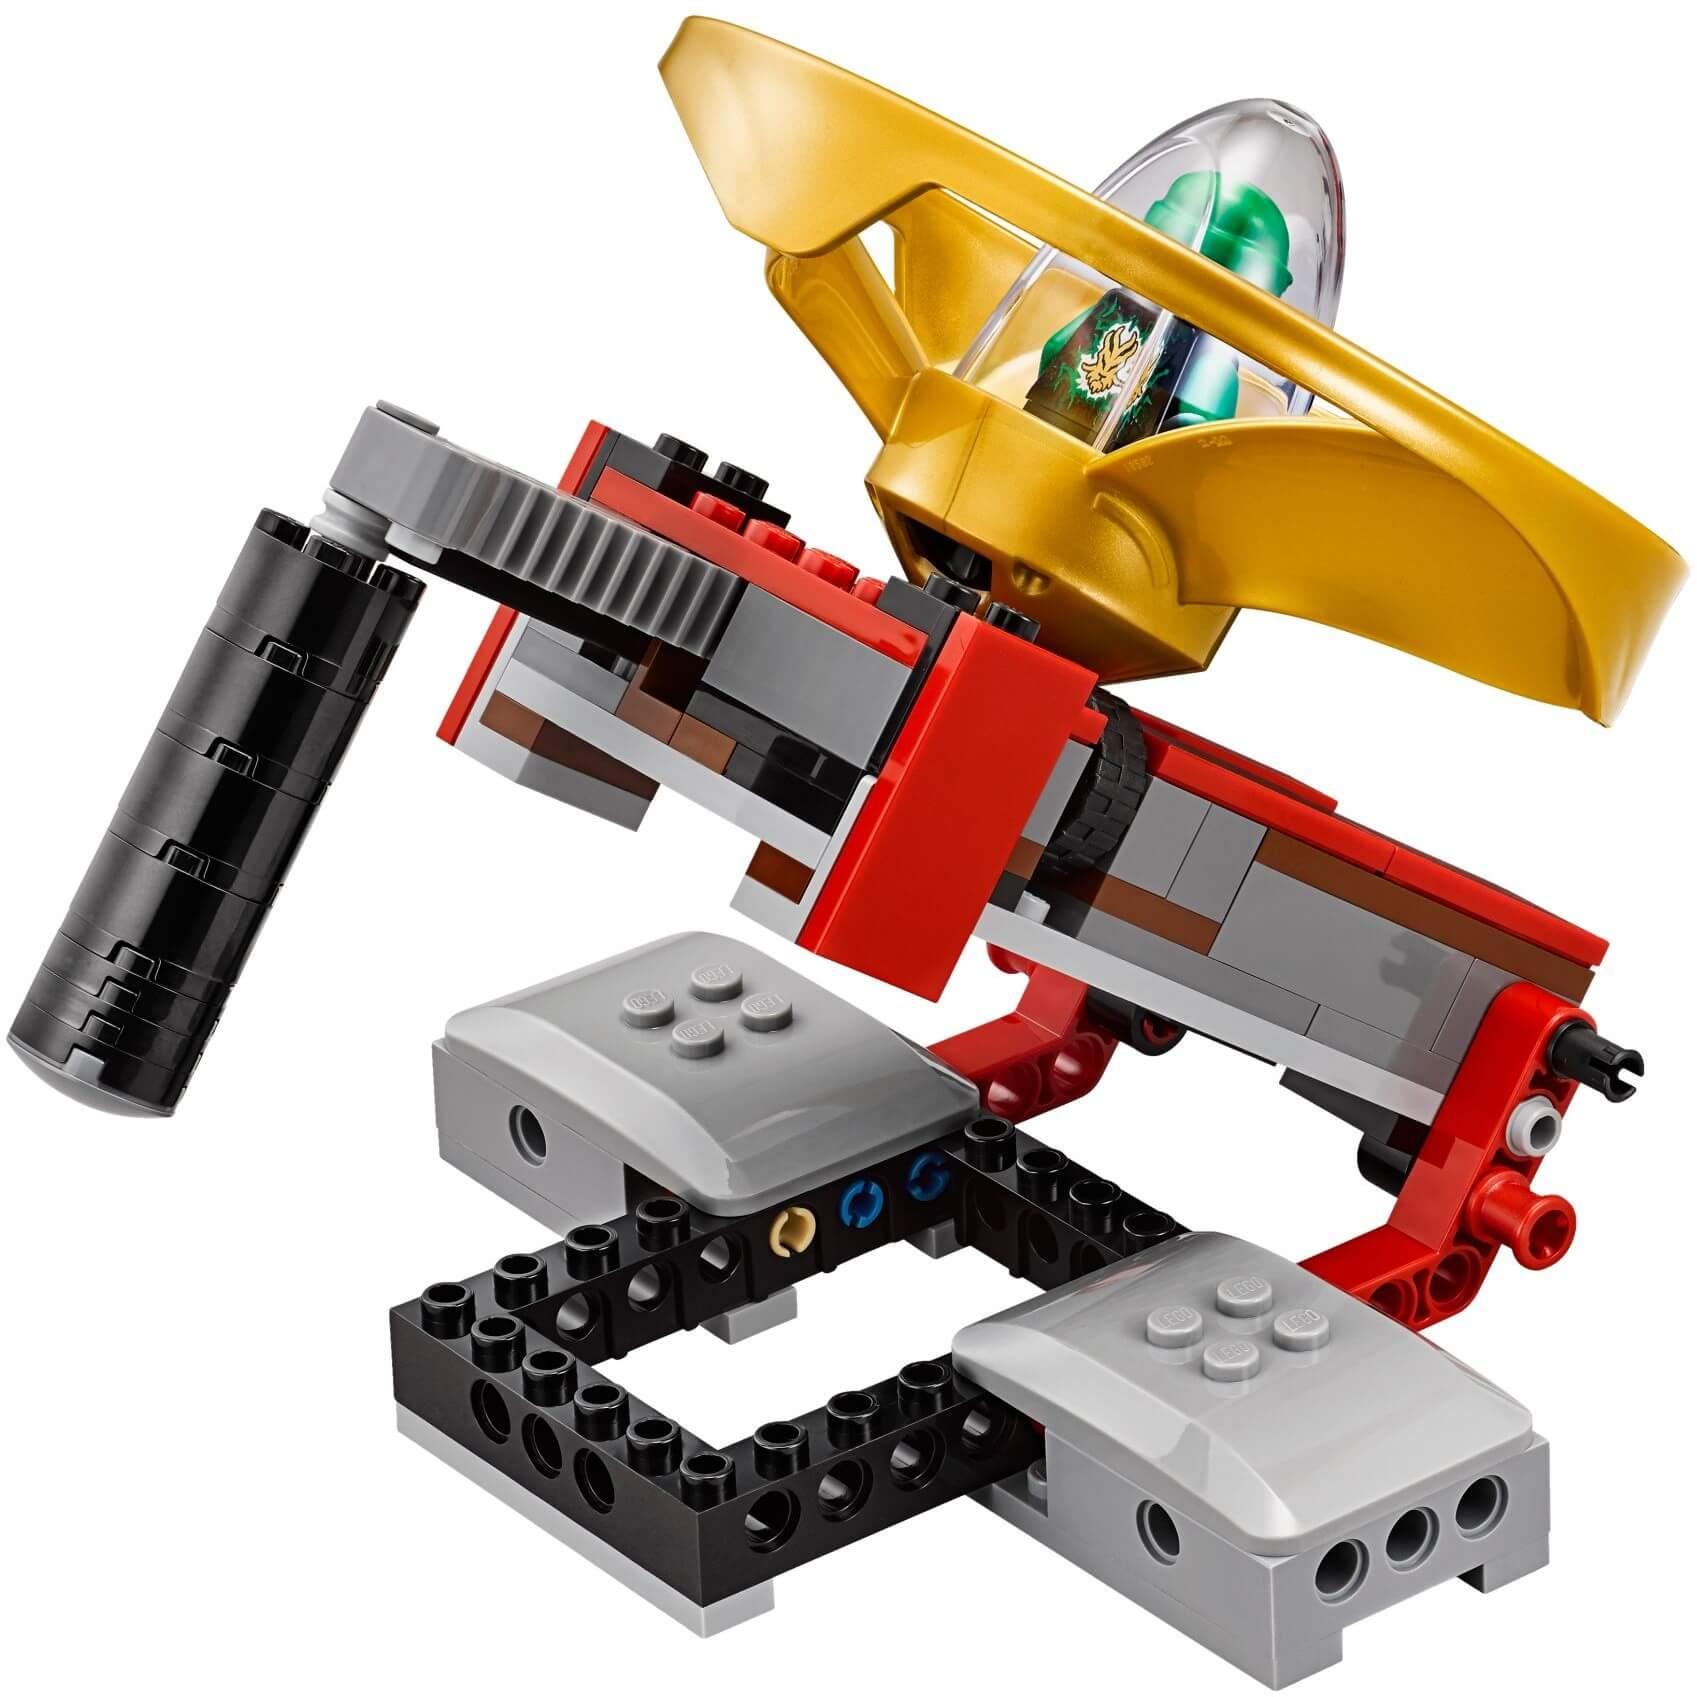 Mua đồ chơi LEGO 70590 - LEGO Ninjago 70590 - Đấu Trường Airjitzu (LEGO Ninjago Airjitzu Battle Grounds 70590)